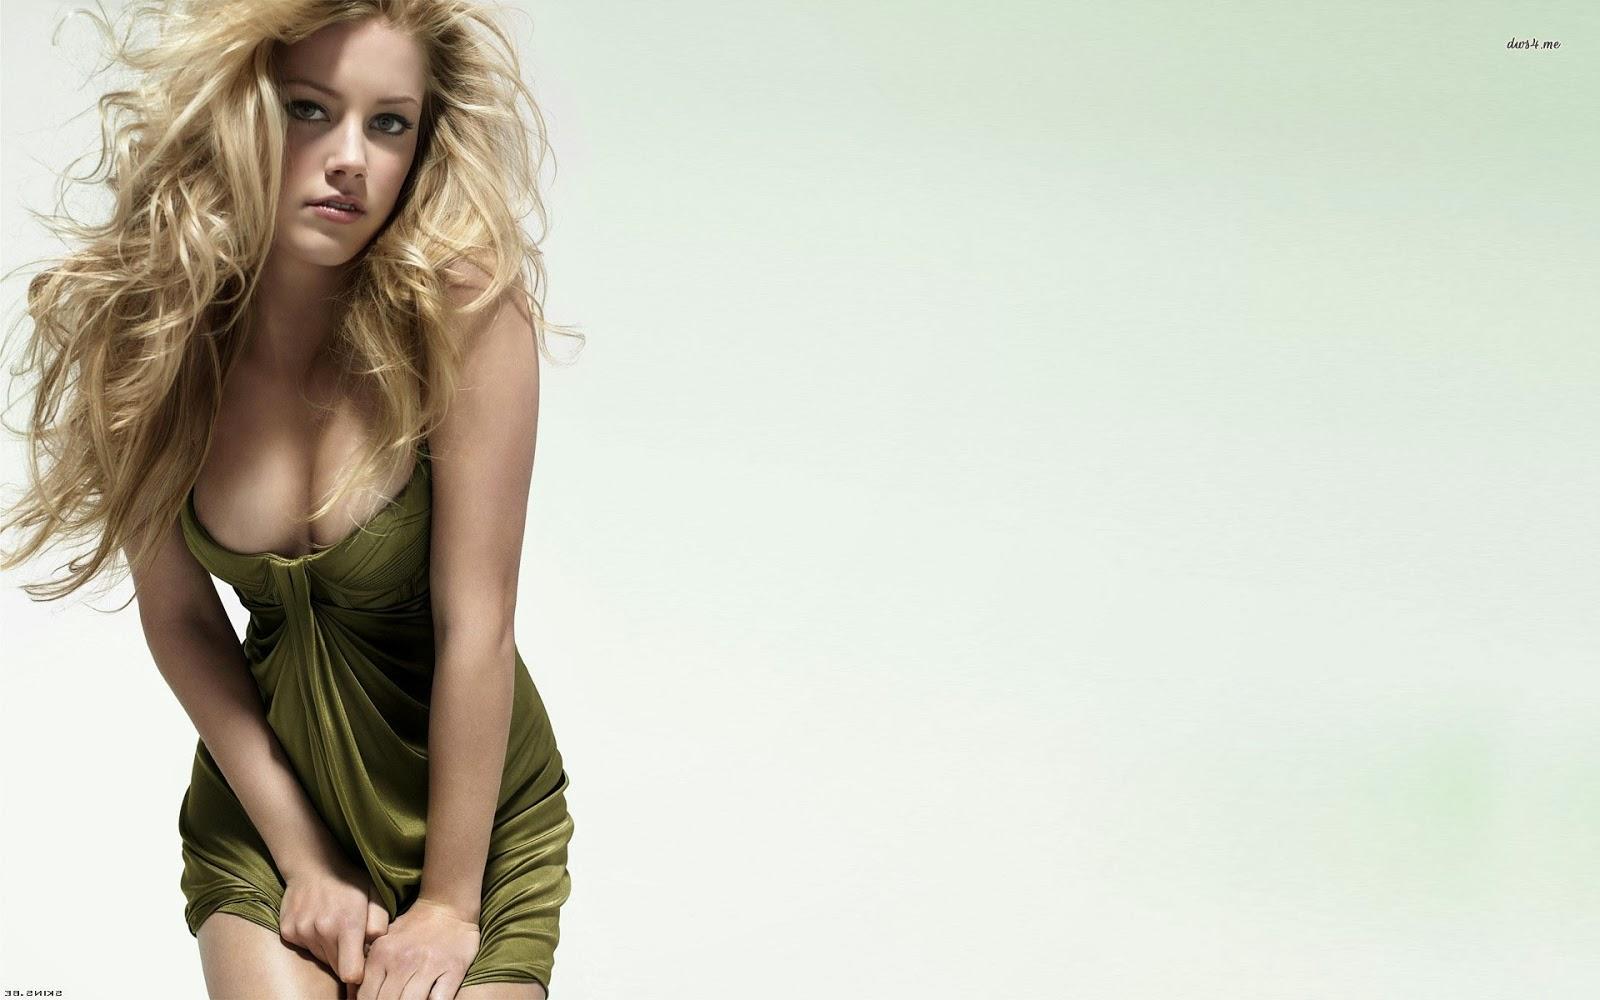 Cute Stylish Girl Wallpaper Download Sexy Amber Heard Hd Wallpapers Fine Food